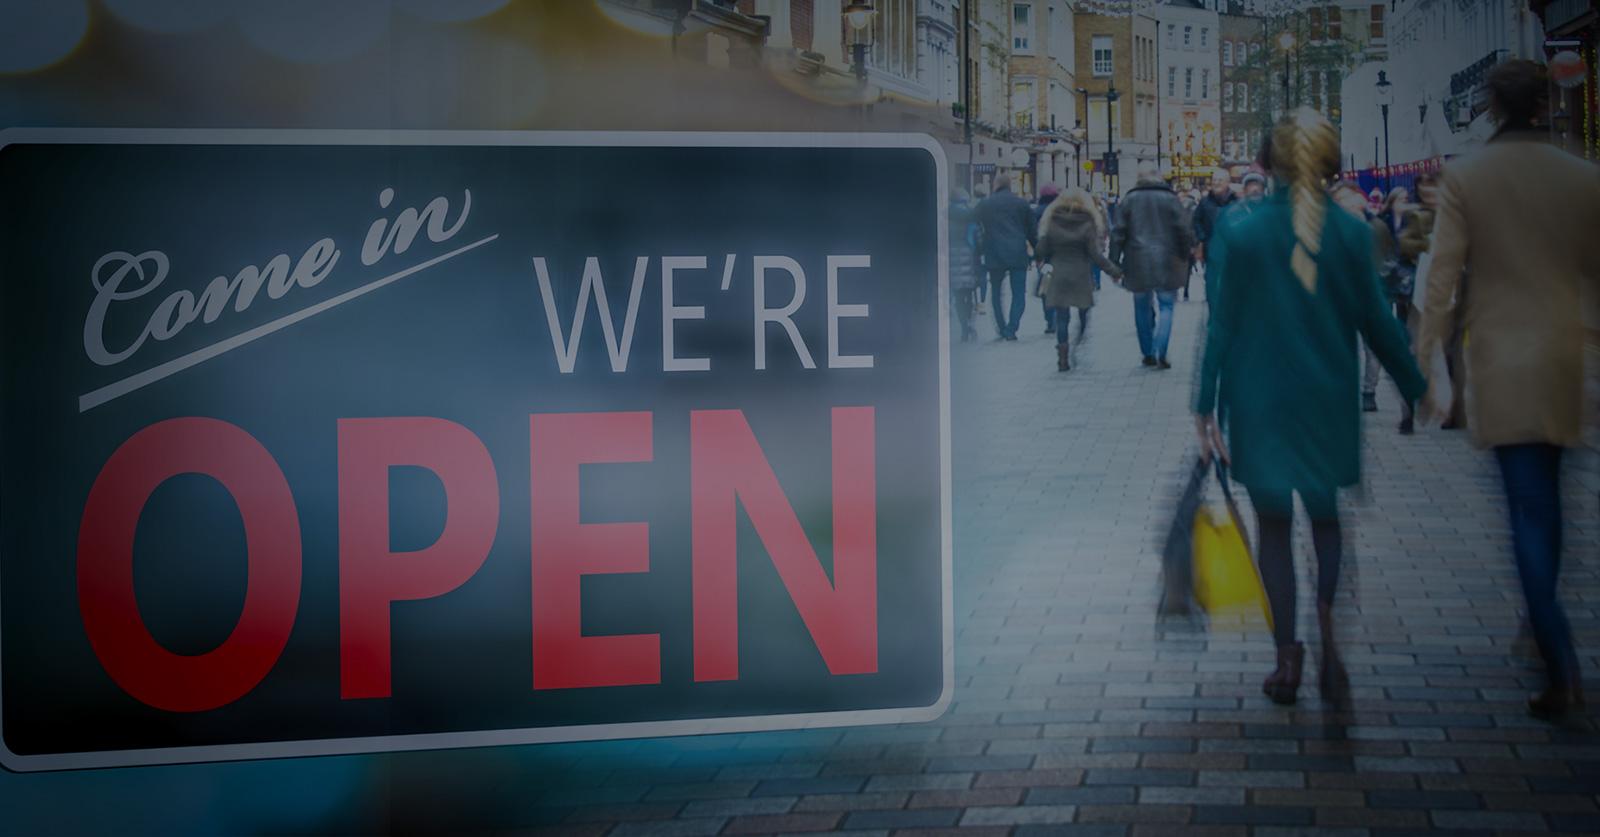 Optimize retail webinar open